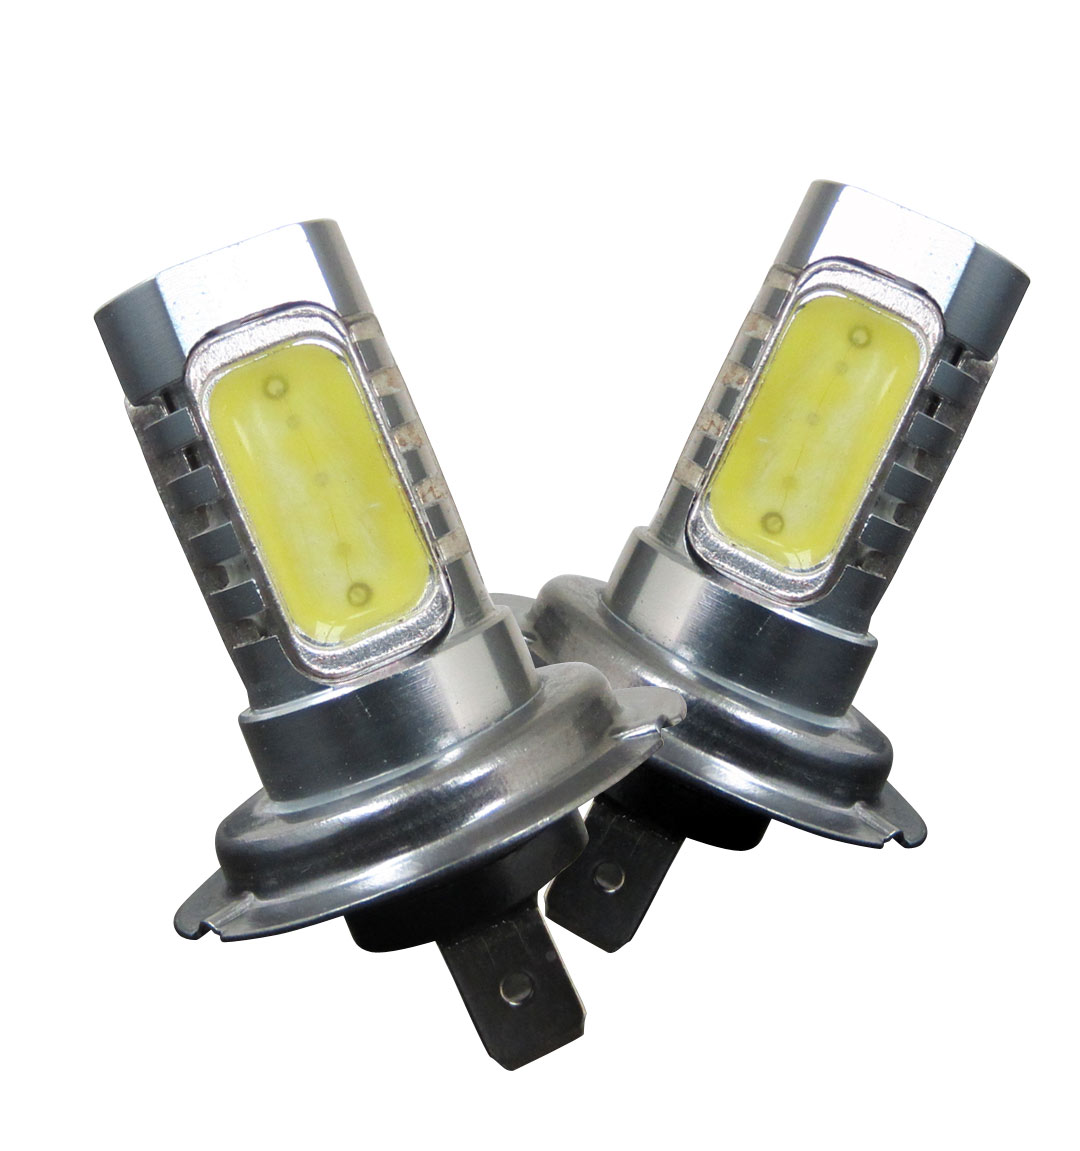 H7 LED Bulbs 6W [2x H7-6W-W] - $19.99